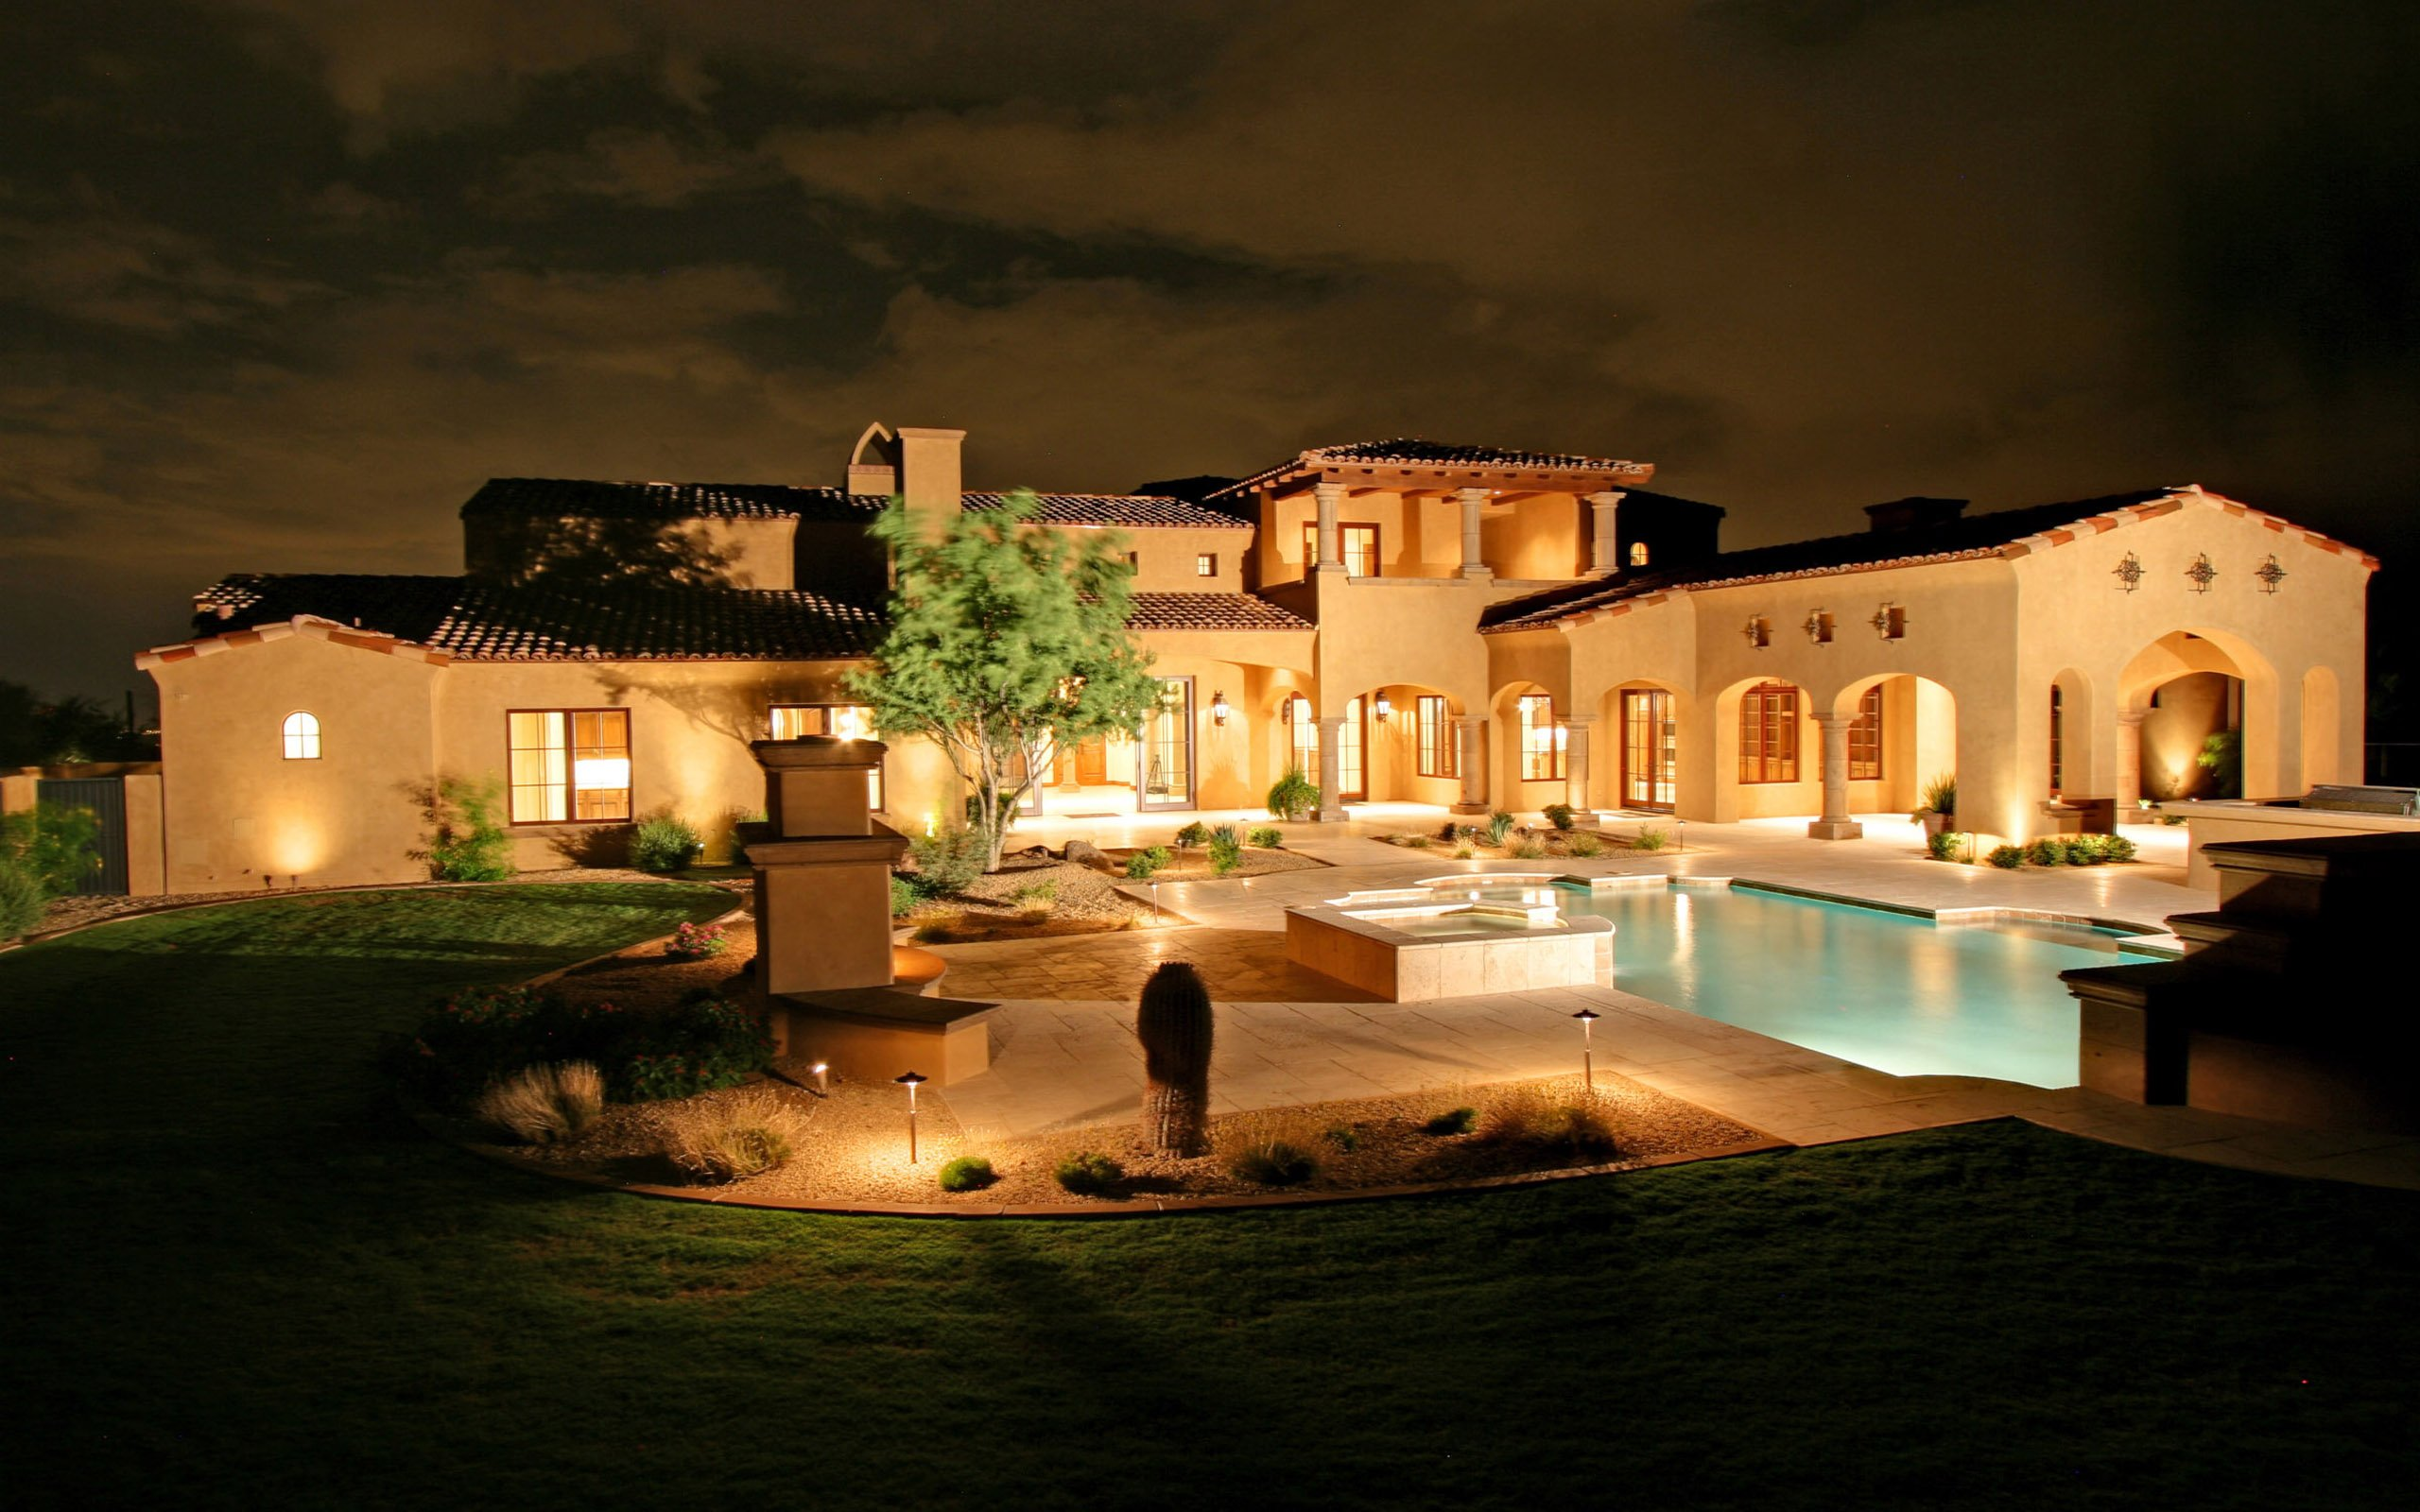 87] Luxury House Wallpapers on WallpaperSafari 2560x1600